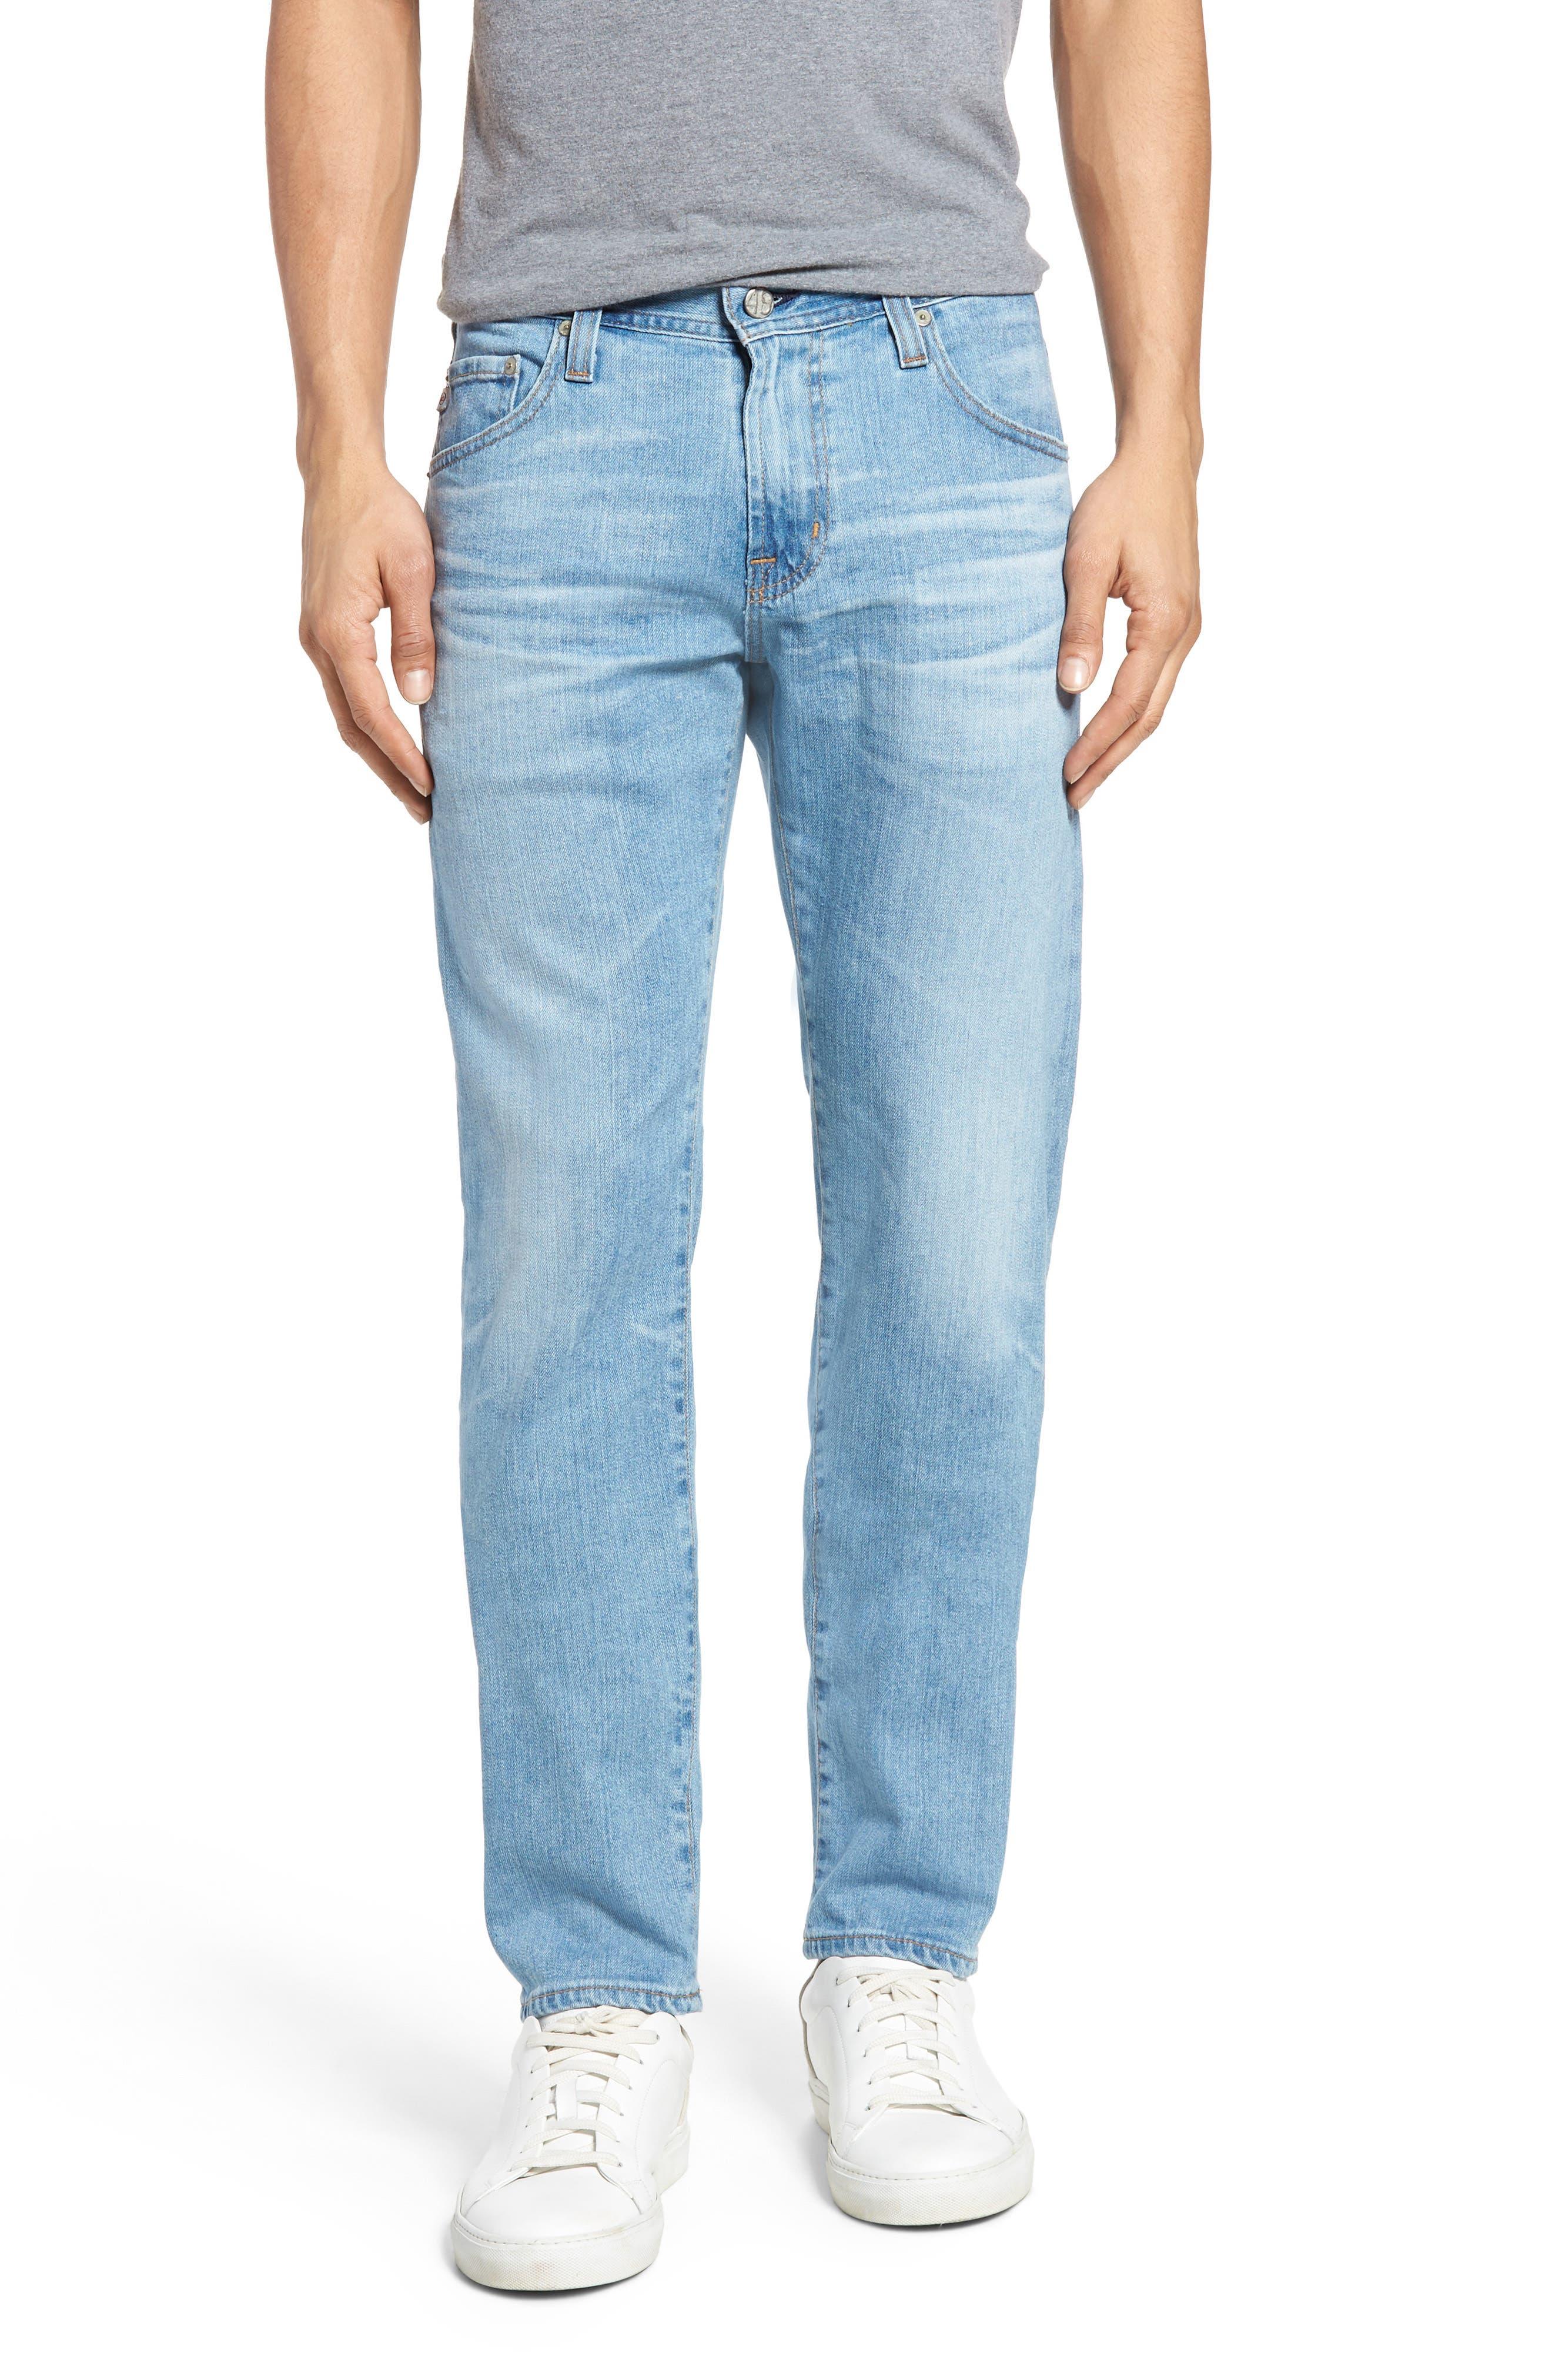 Tellis Slim Fit Jeans,                         Main,                         color, 24 Years Novel